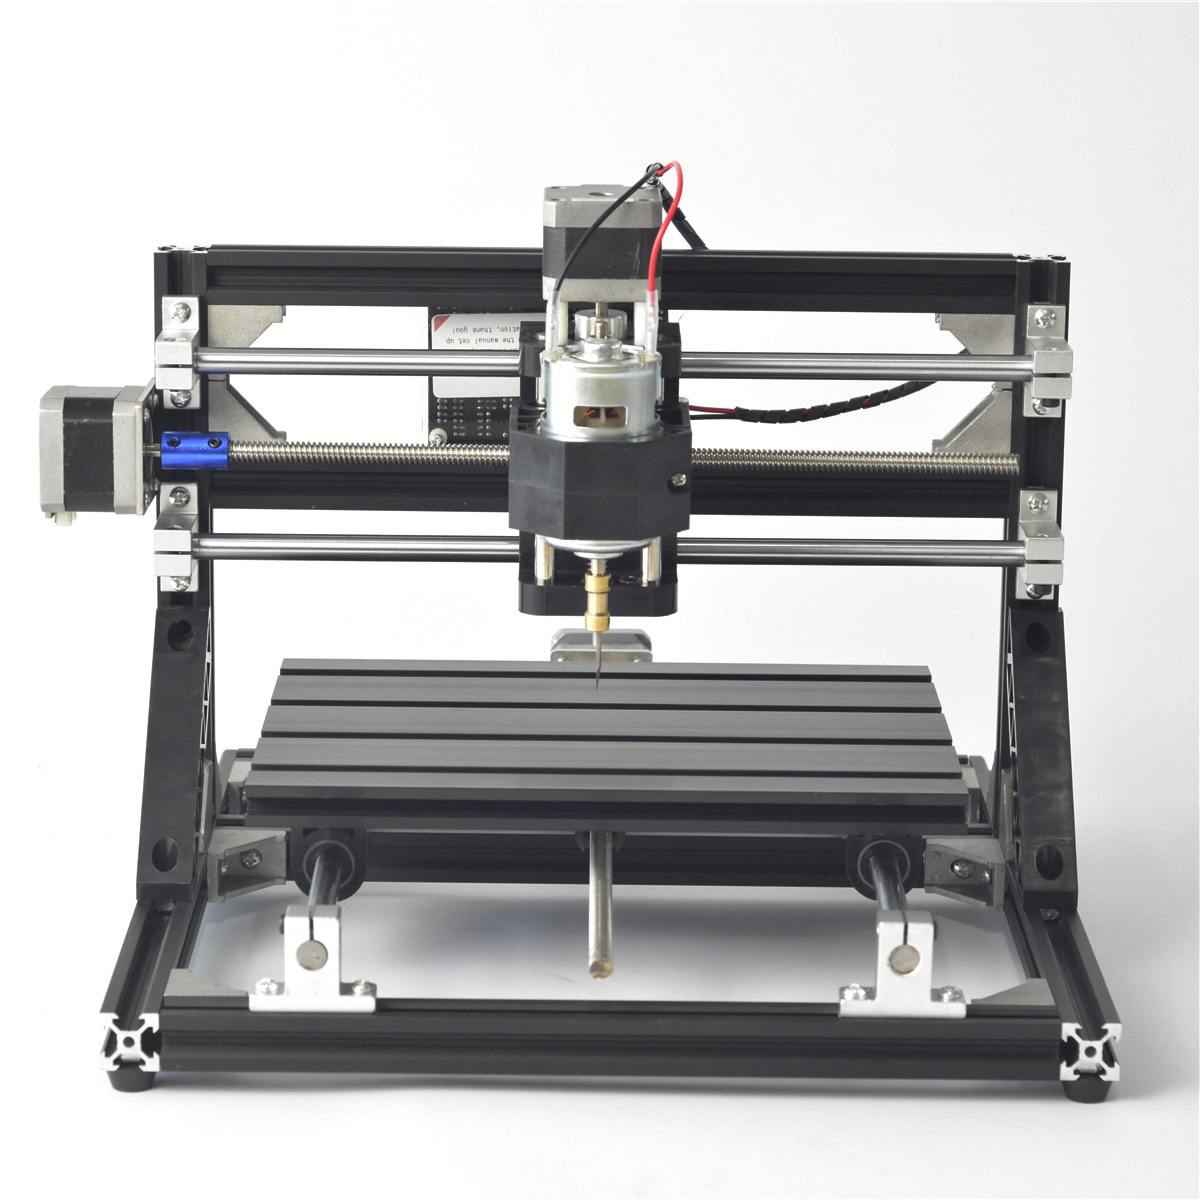 CNC3018 Diy Mini CNC Engraving Machine Laser Engraving PCB PVC CNC Milling Machine GRBL Wood Router DIY Hobby Cutting Tools